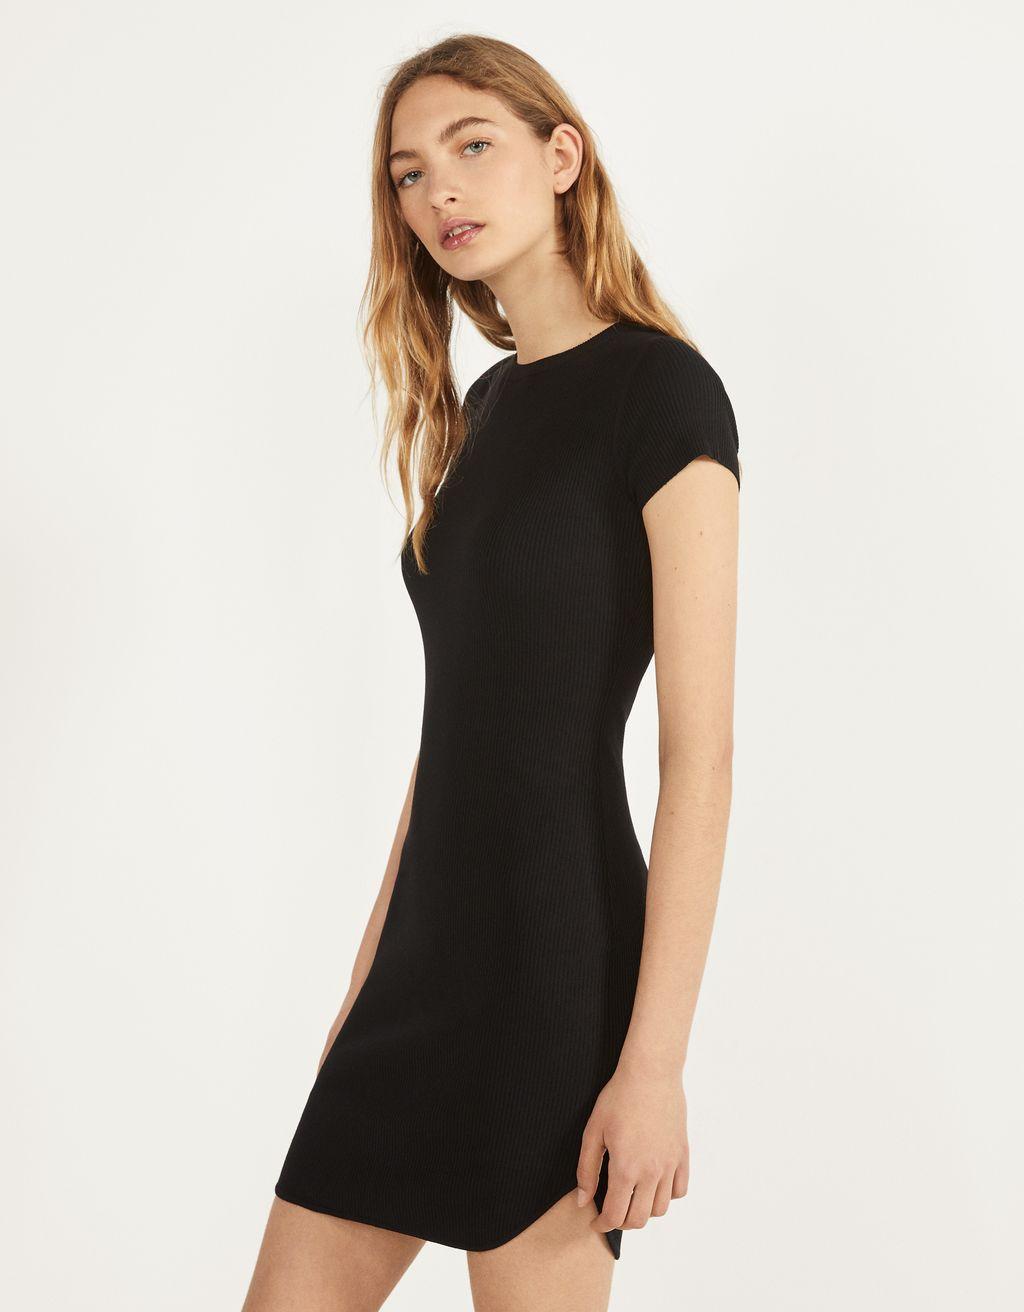 Fitilli kısa elbise